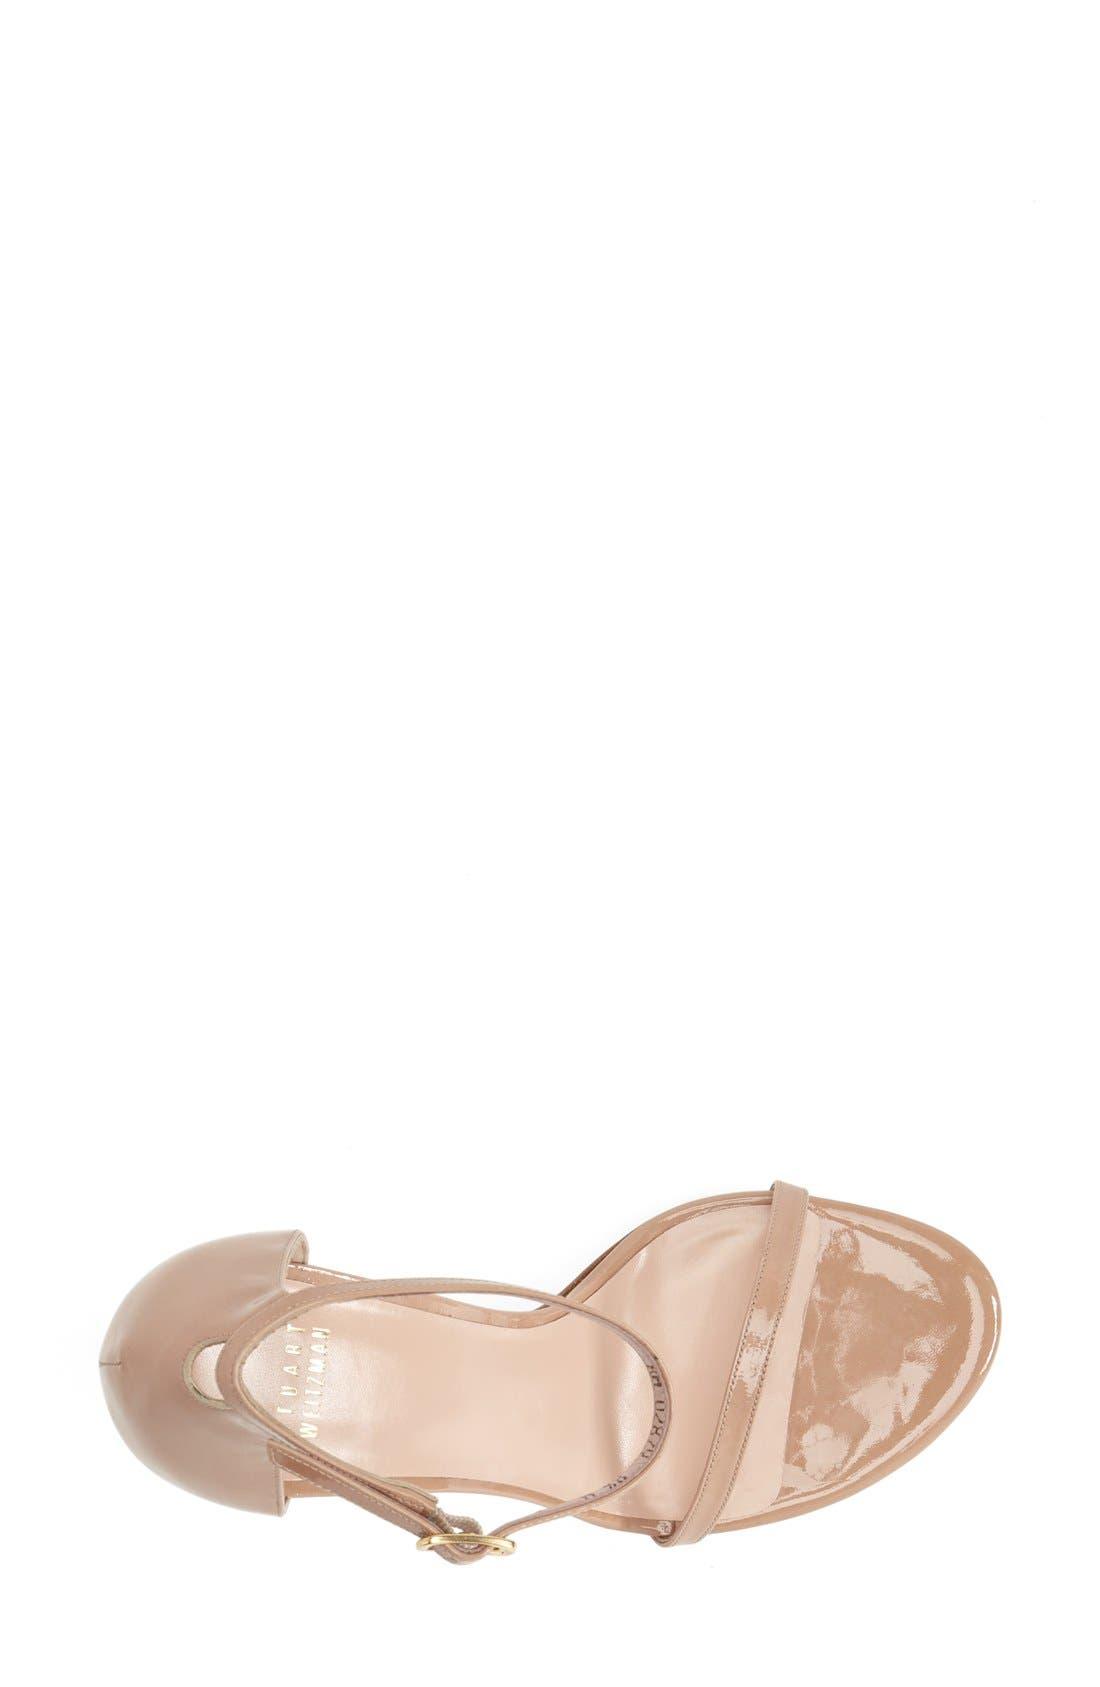 Nudistsong Ankle Strap Sandal,                             Alternate thumbnail 151, color,